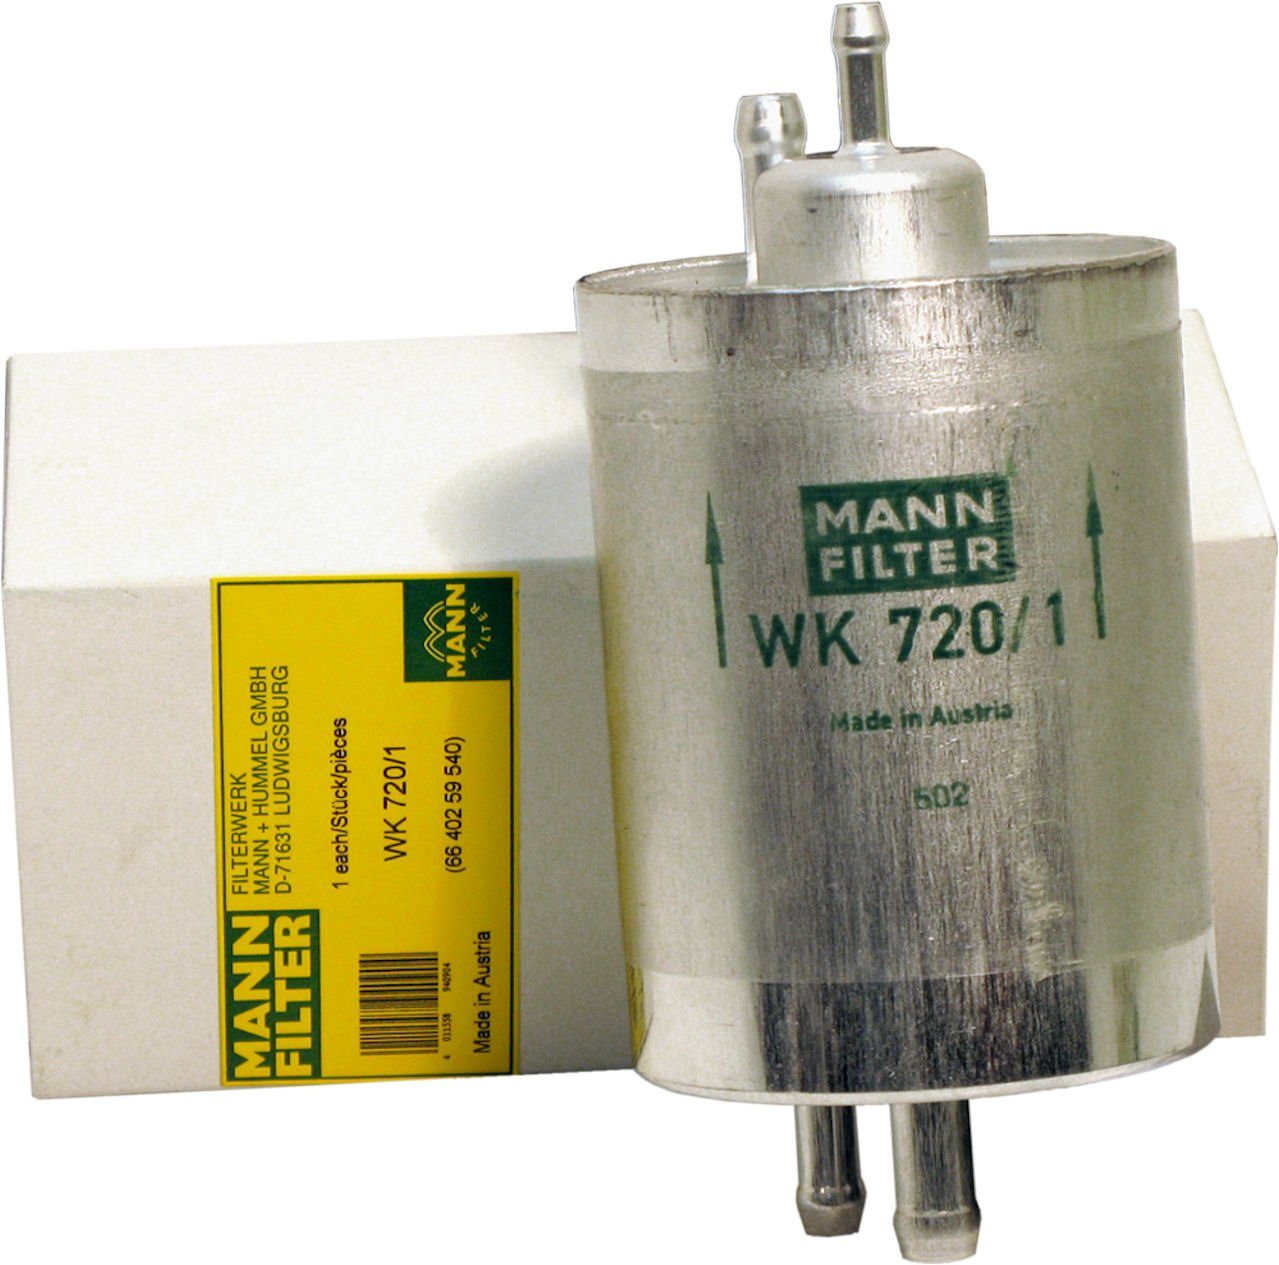 fuel filter mann wk532 1 wiring diagram Russell Fuel Filters fuel filter mann wk532 1 wiring libraryfuel filter mann wk532 1